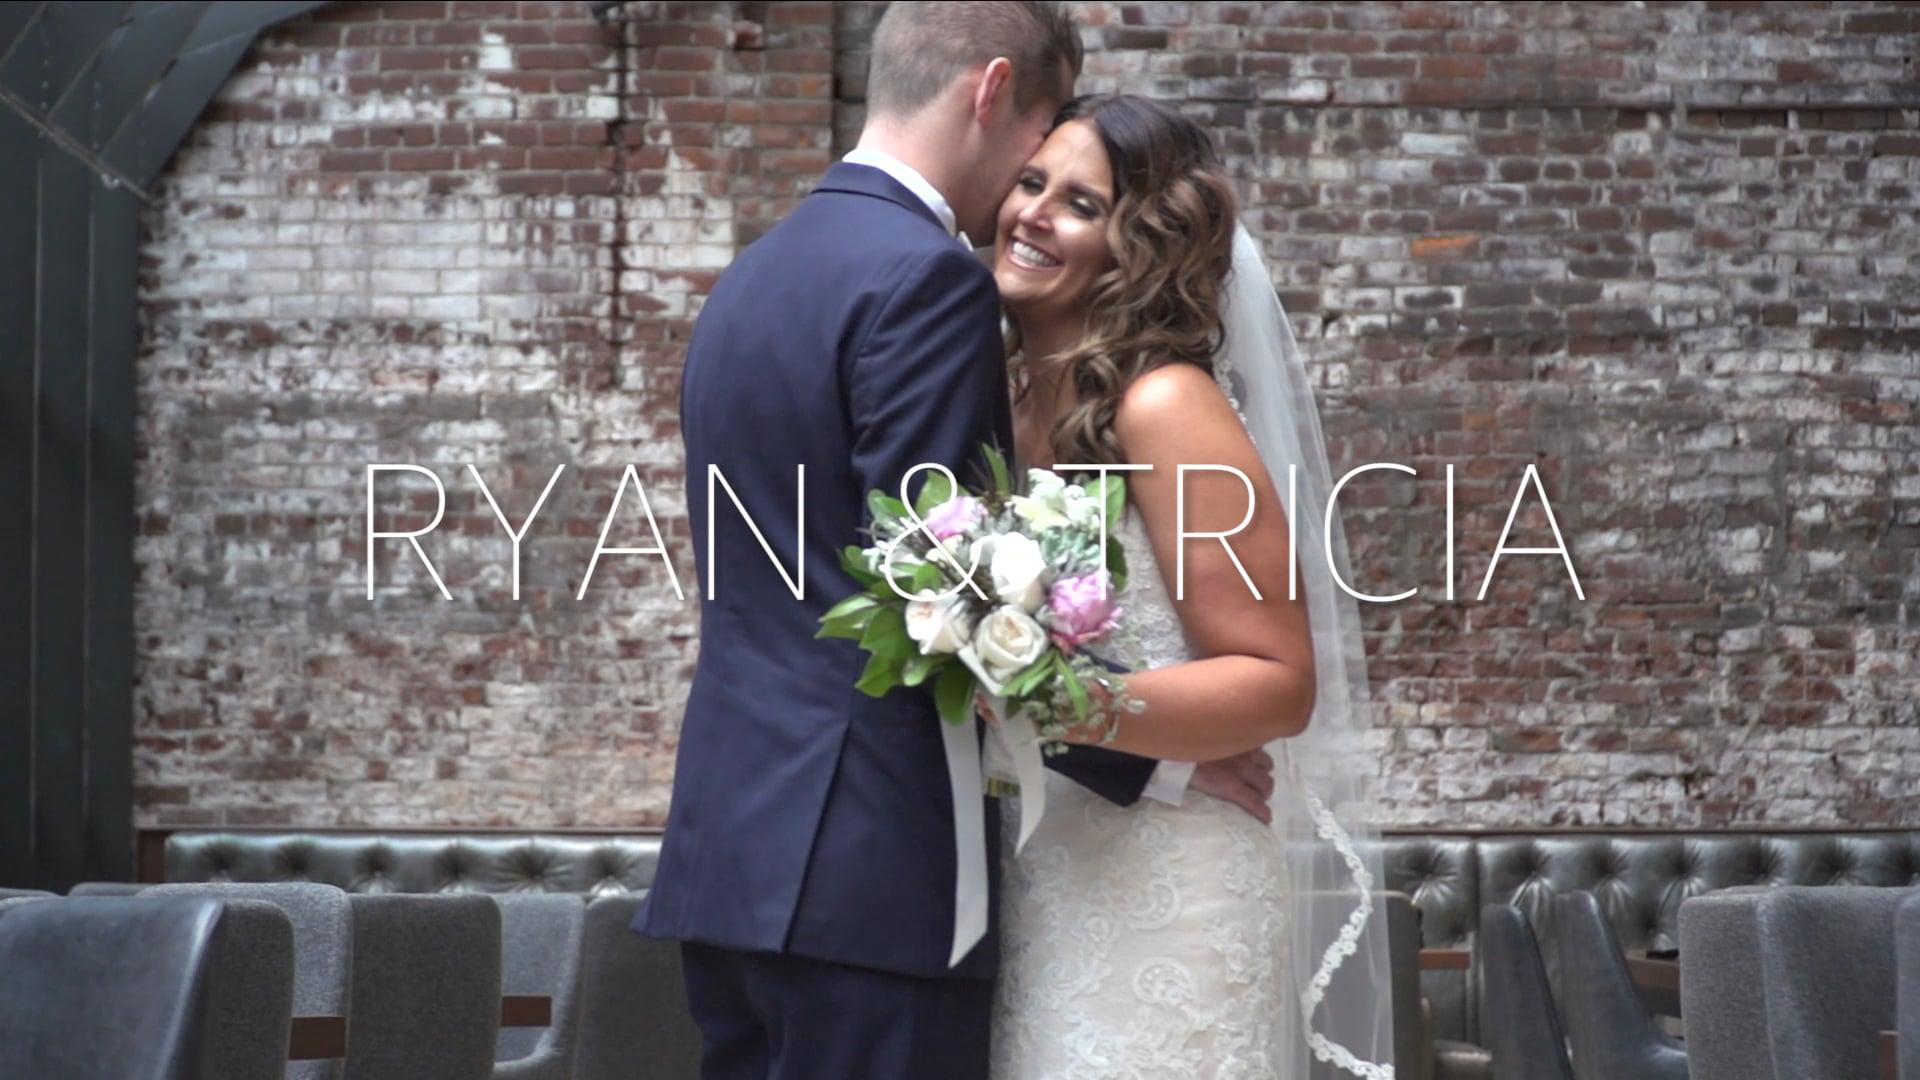 Ryan & Tricia Doyle - Wedding Feature